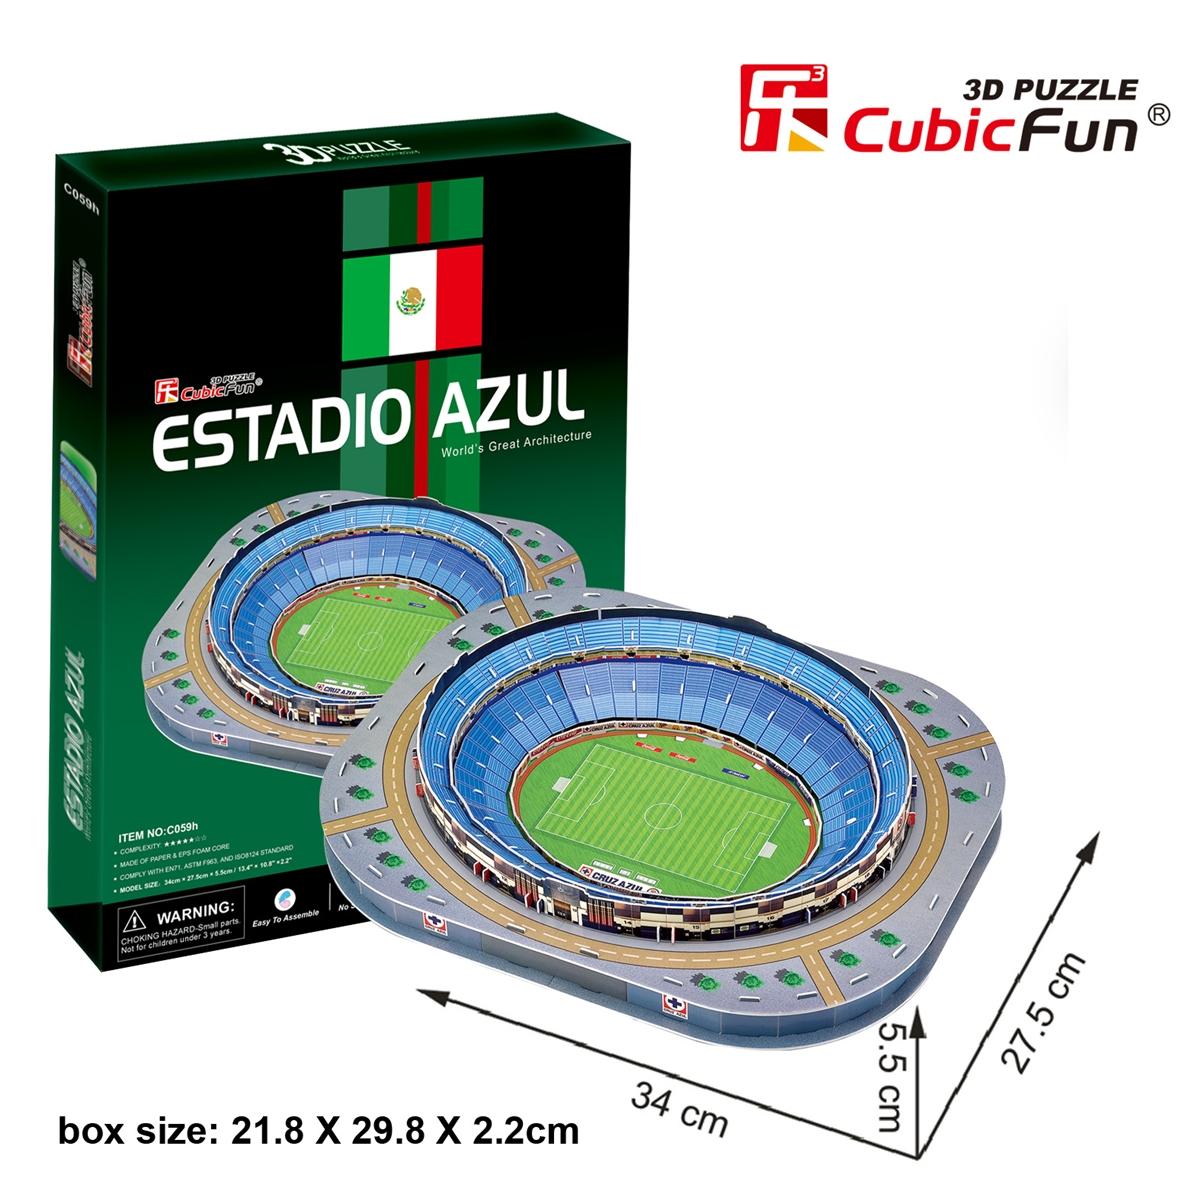 Cubic Fun 3D Paper Puzzle Mexico Stadiums Estadio Azul Model ฟุตบอลทีมชาติเม็กซิโก C059H 92pcs 34*27.5*5.5CM